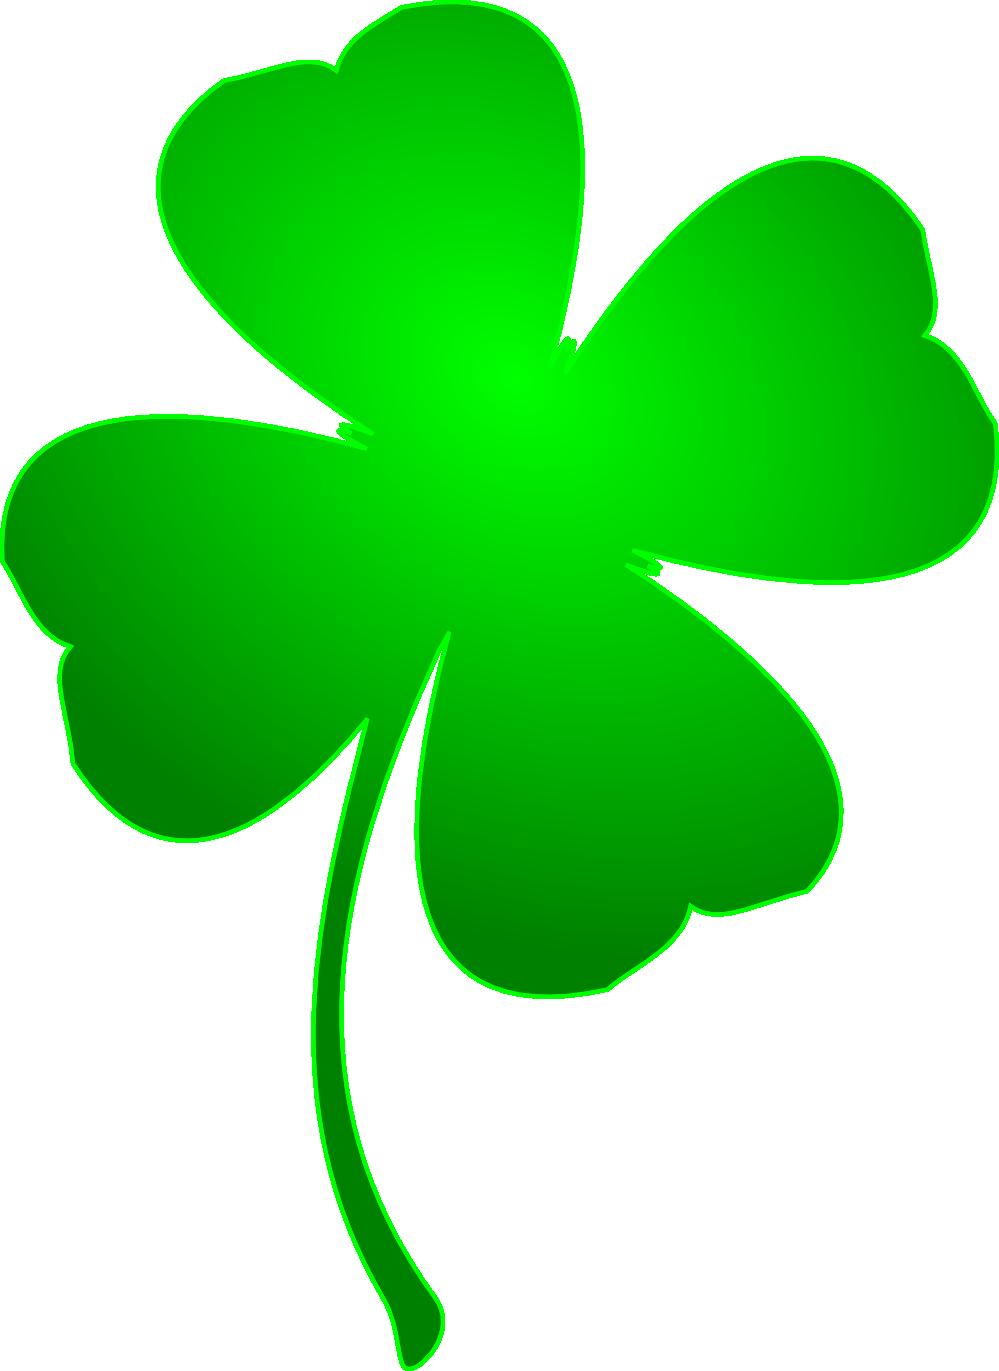 999x1371 Ireland St Patricks Clipart, Explore Pictures